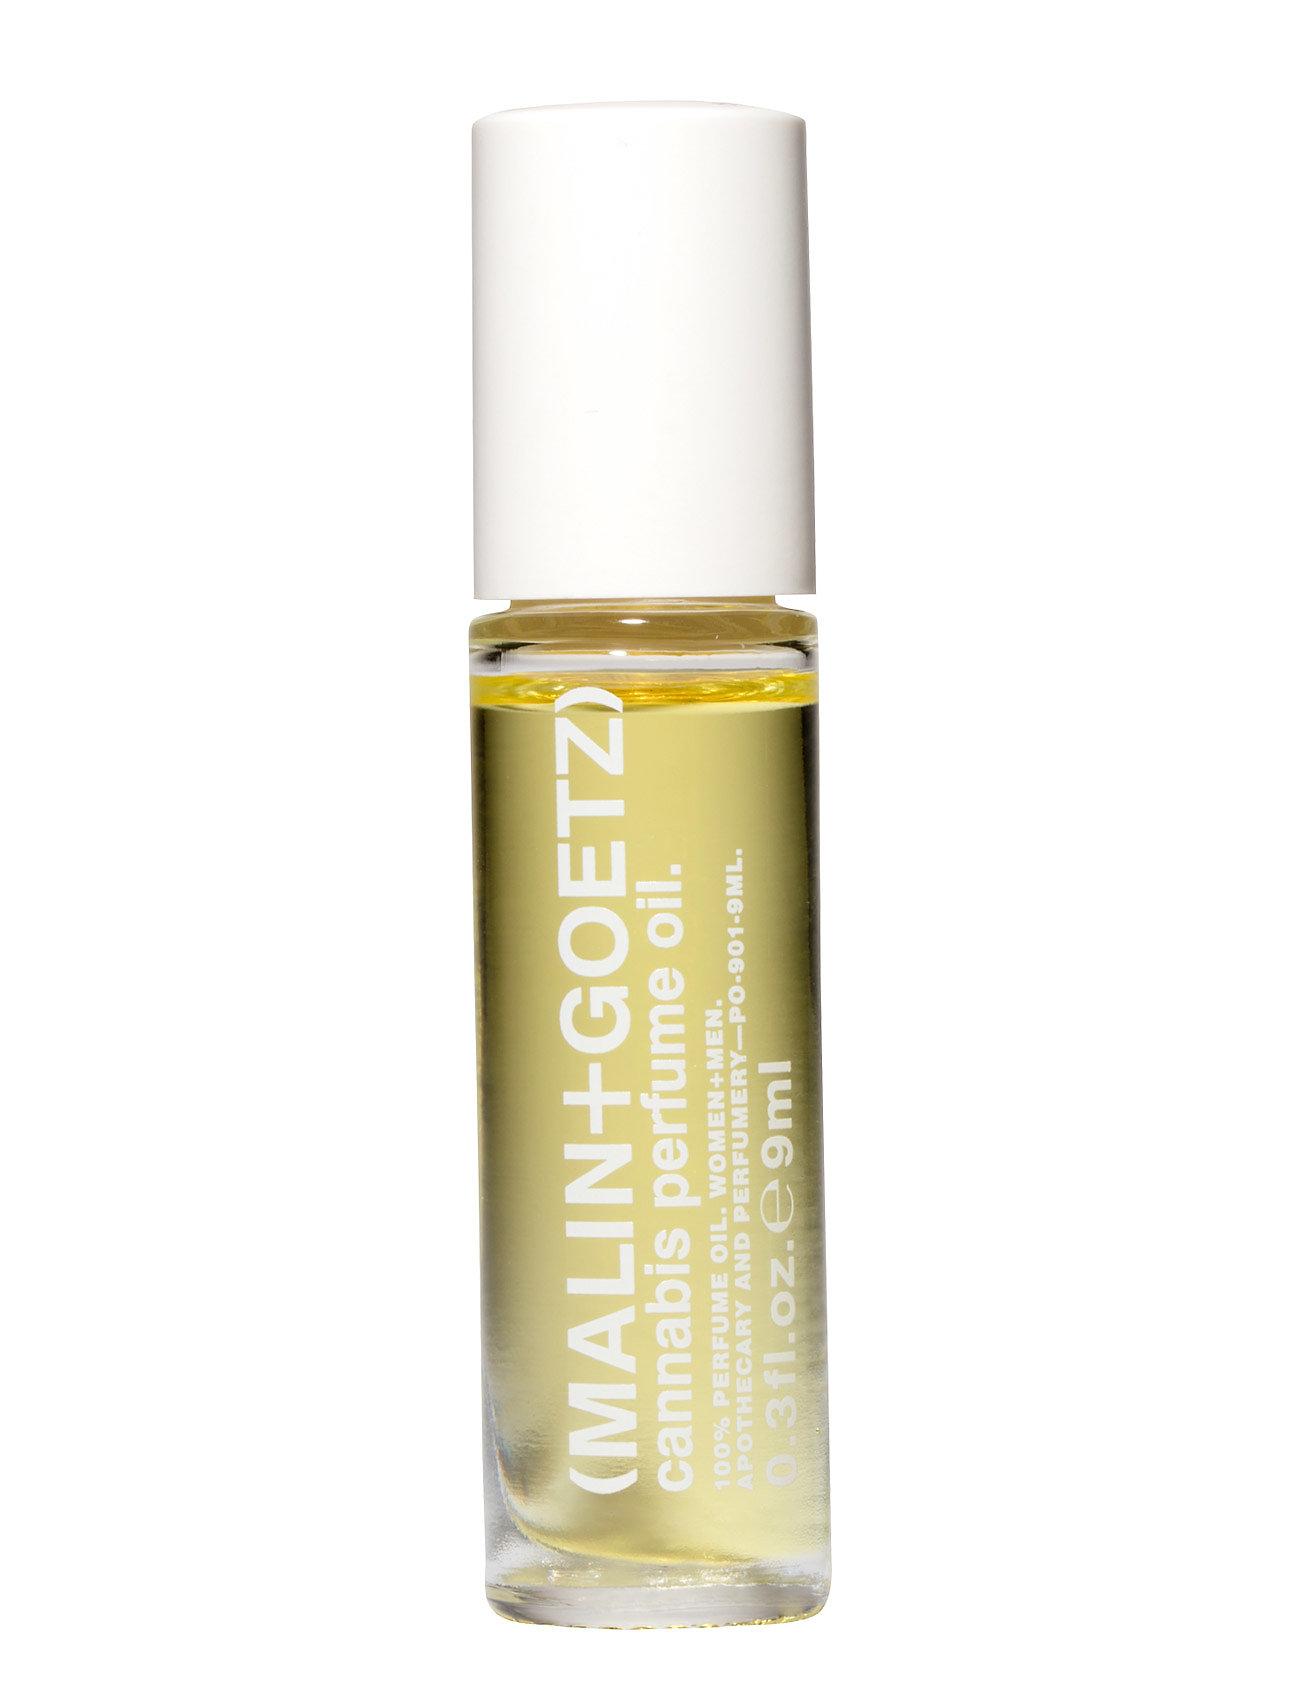 malin+goetz – Cannabis perfume oil på boozt.com dk